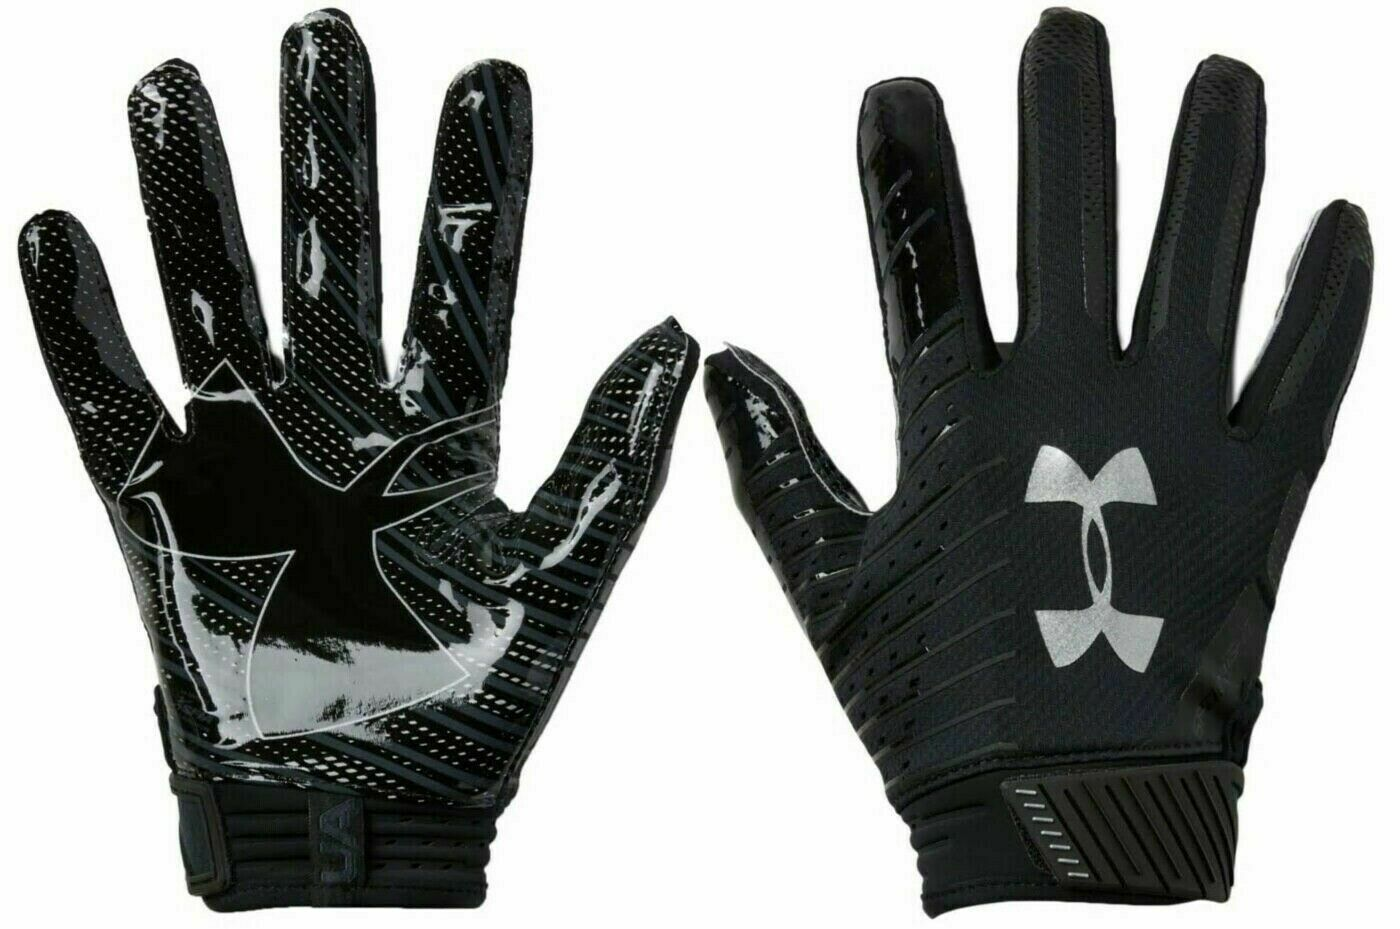 //Metallic Silver Adult Large L Under Armour Mens Sideline Gloves Black 001